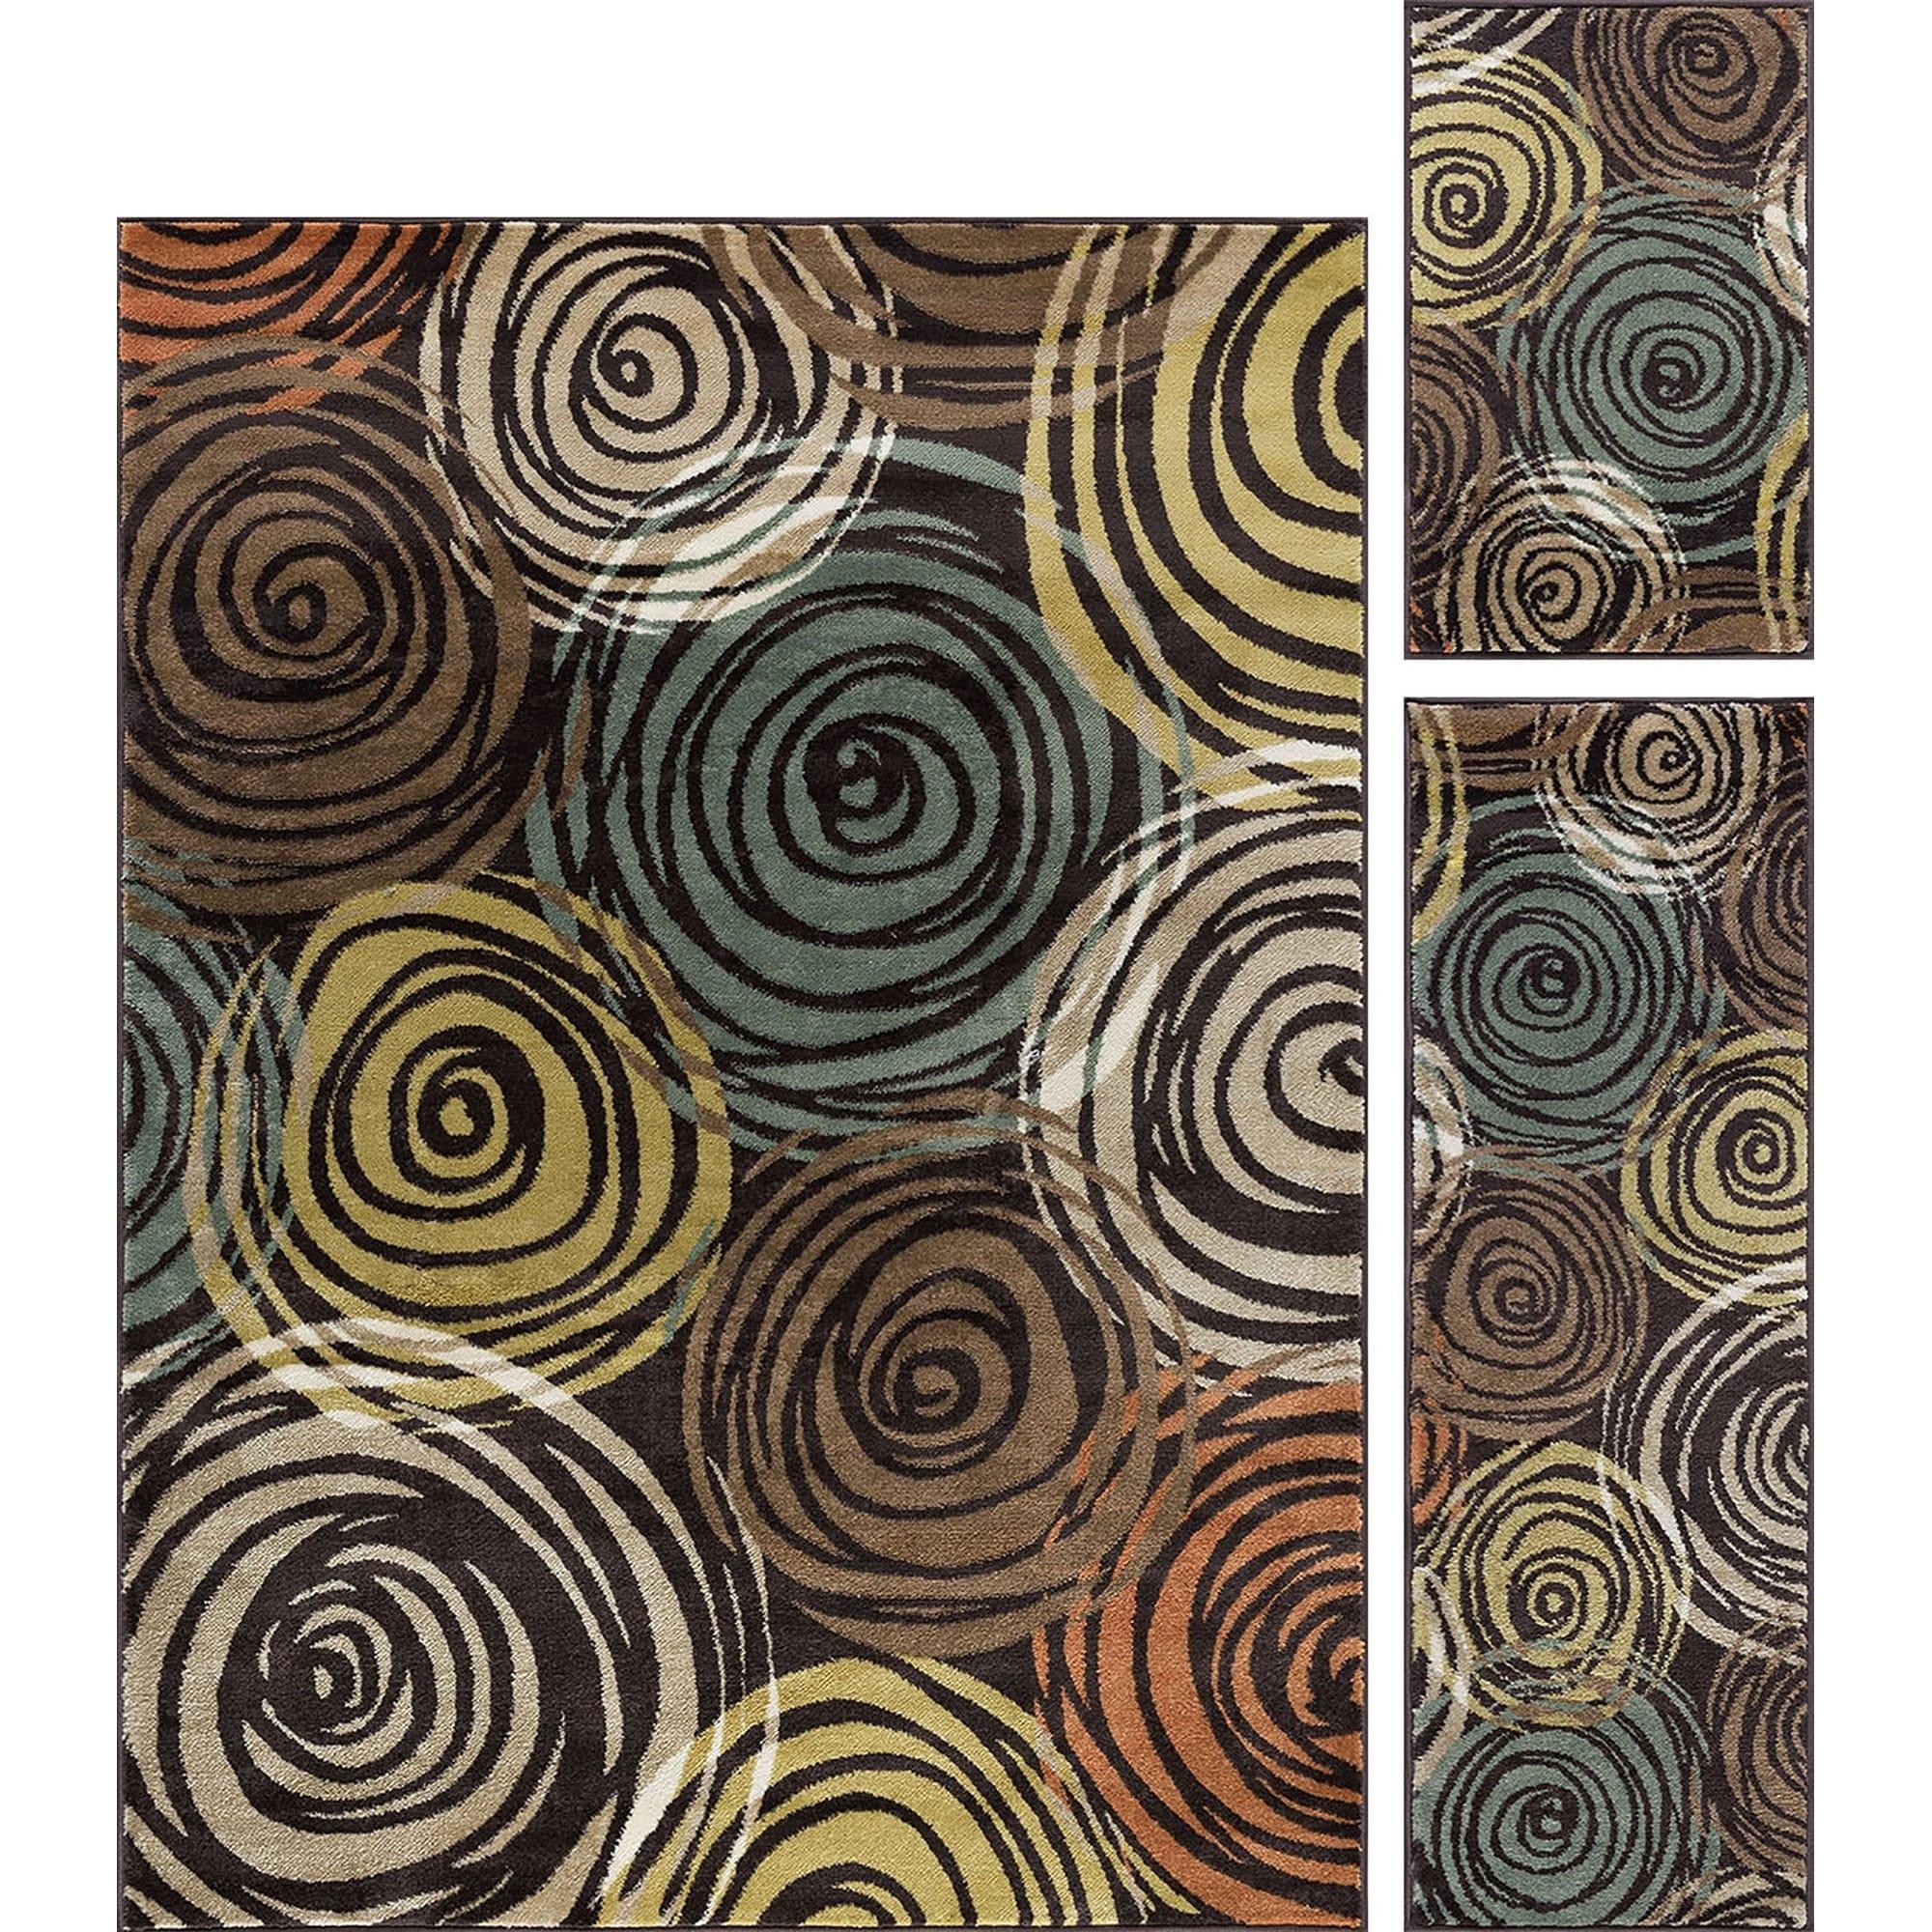 Alise Decora Brown Contemporary Area Rug 3 Piece Set, Siz...